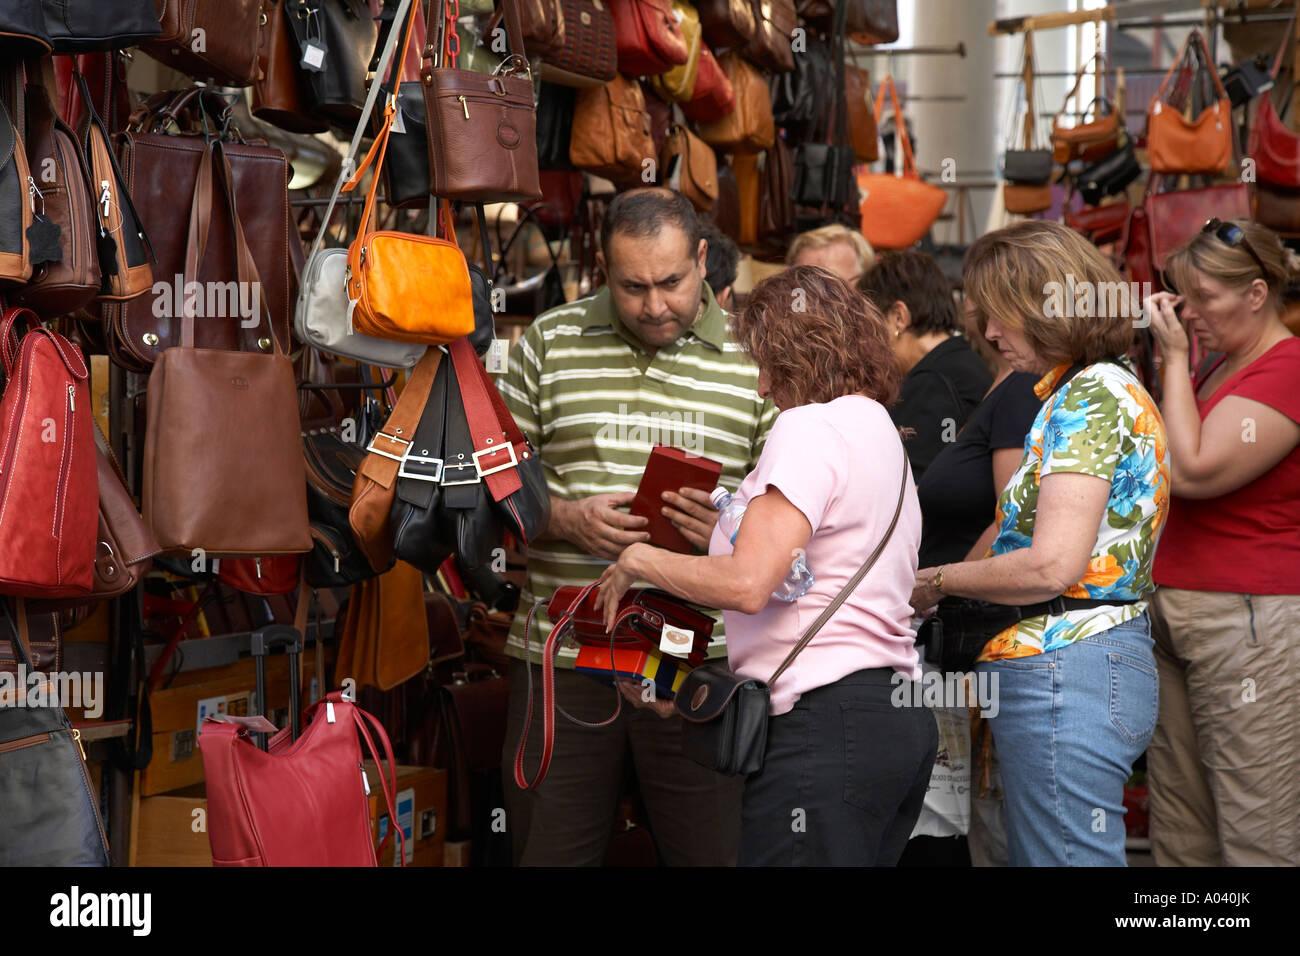 salesman-and-customers-at-handbag-display-in-outdoor-market-firenze-A040JK.jpg